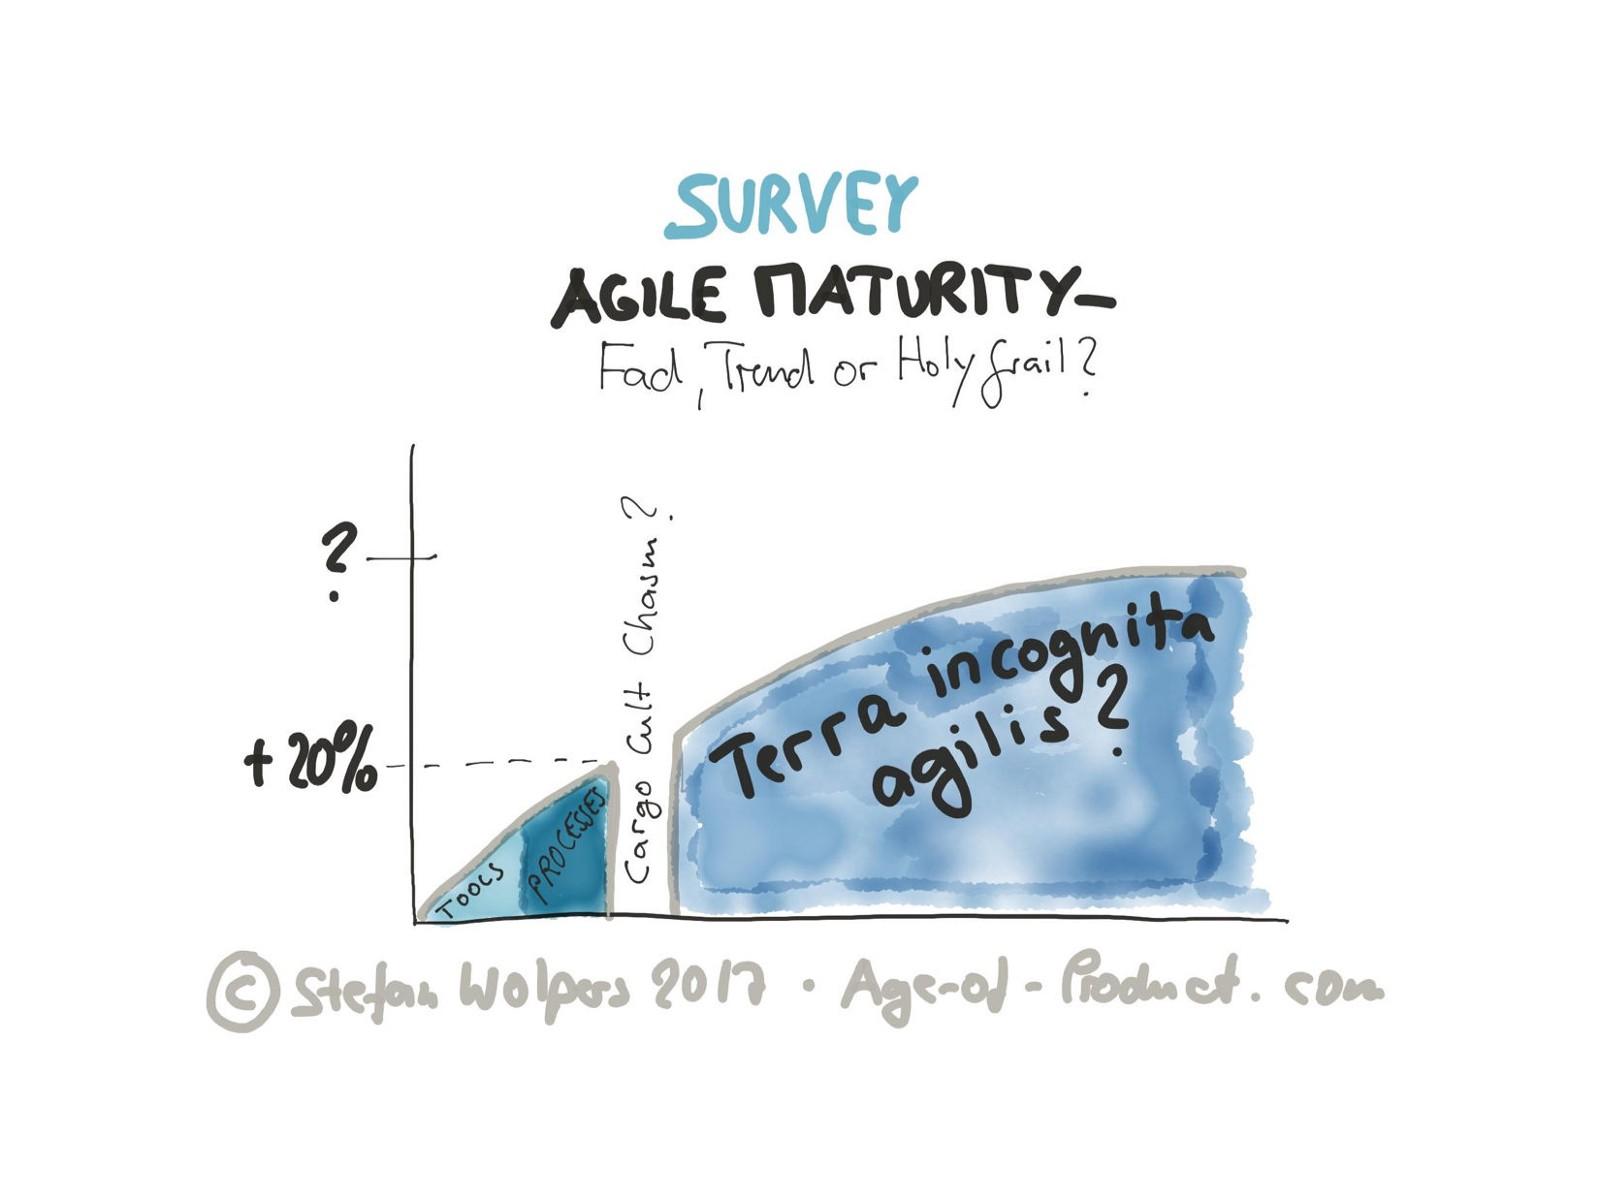 /agile-maturity-survey-595bfb021443 feature image